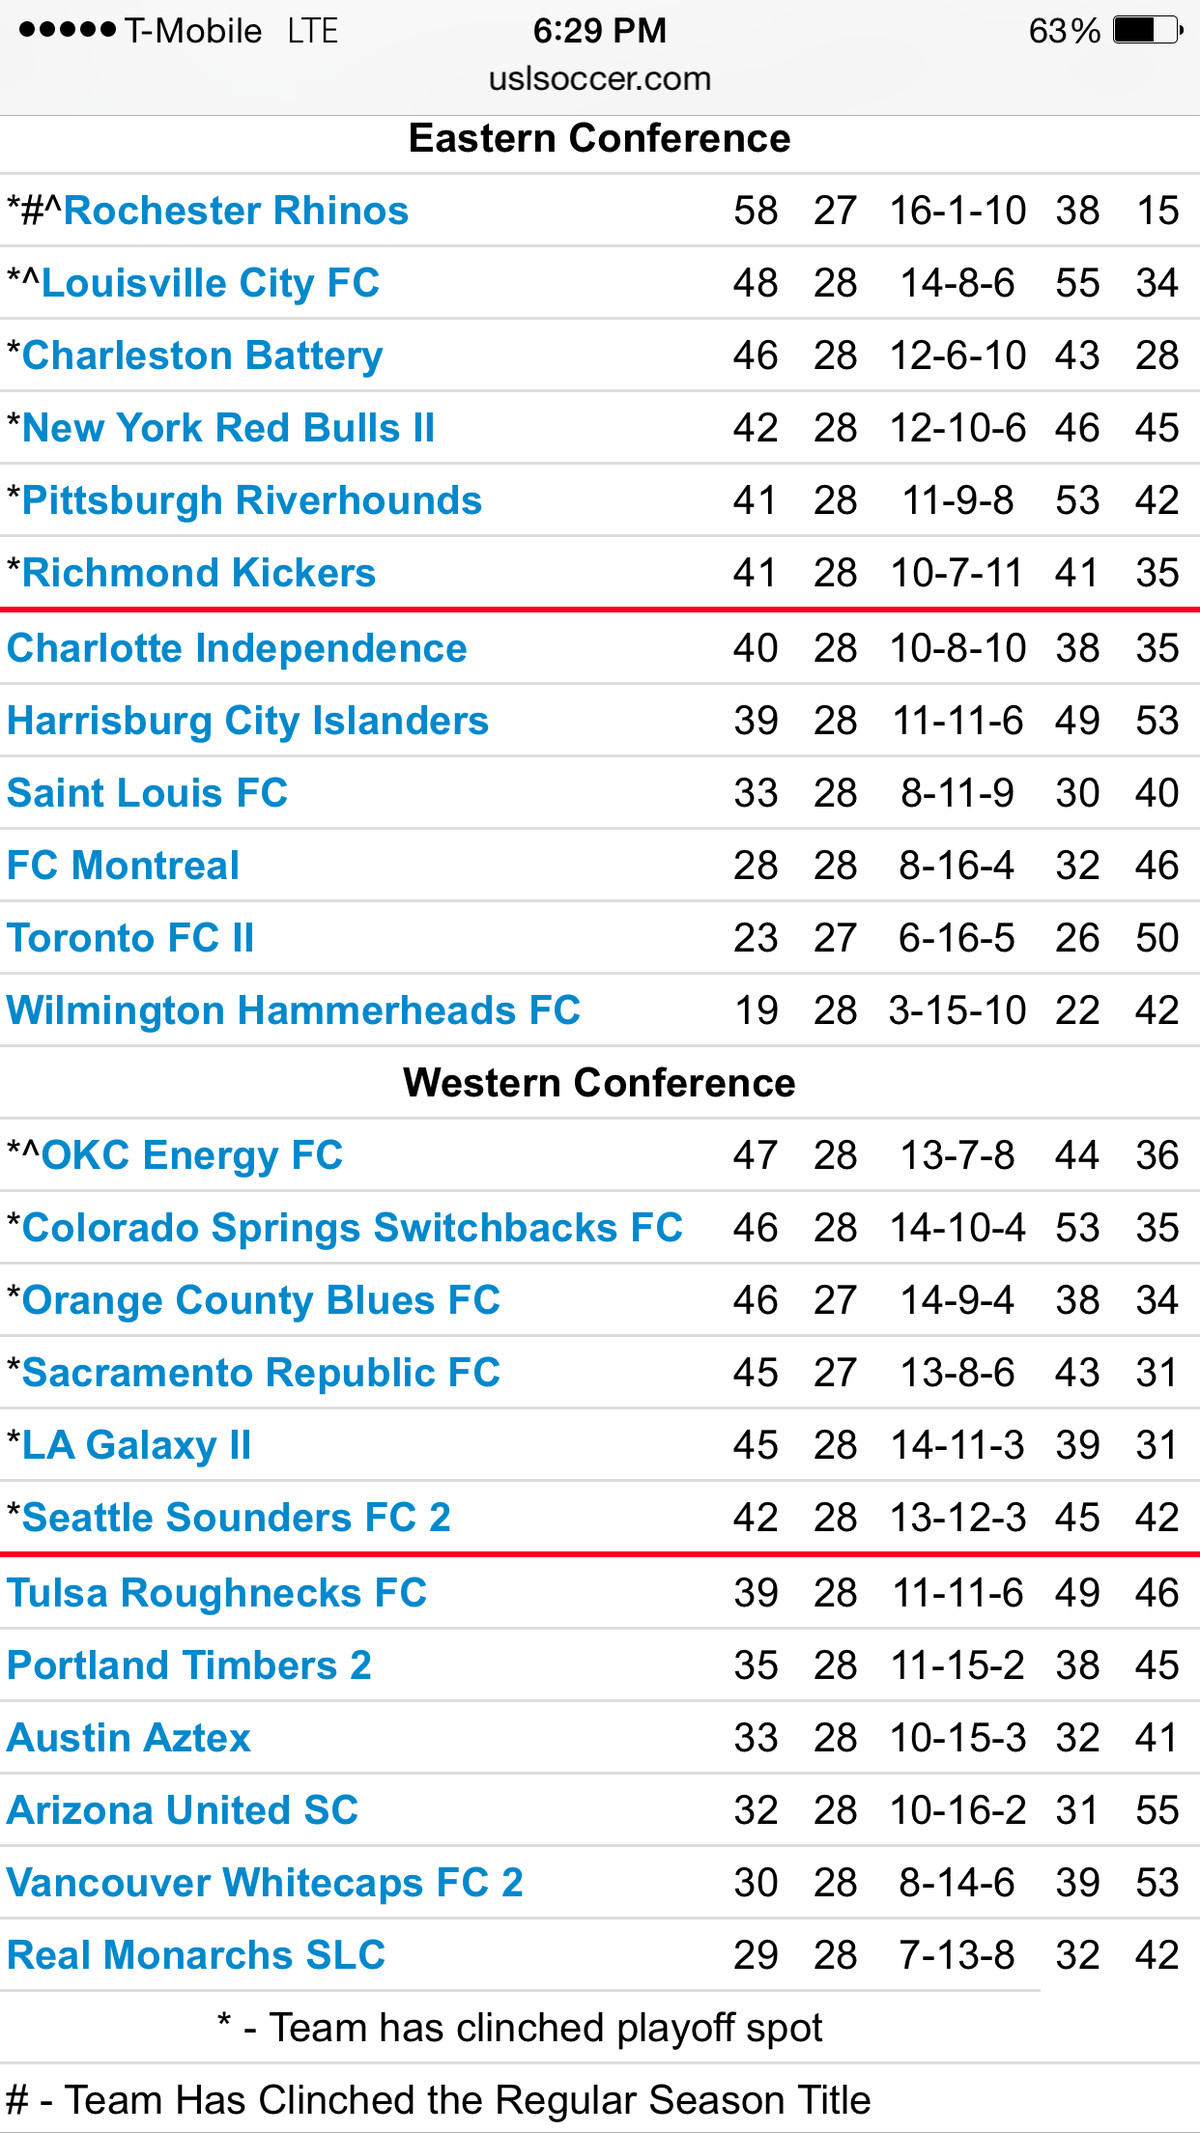 USL Standings 9-20